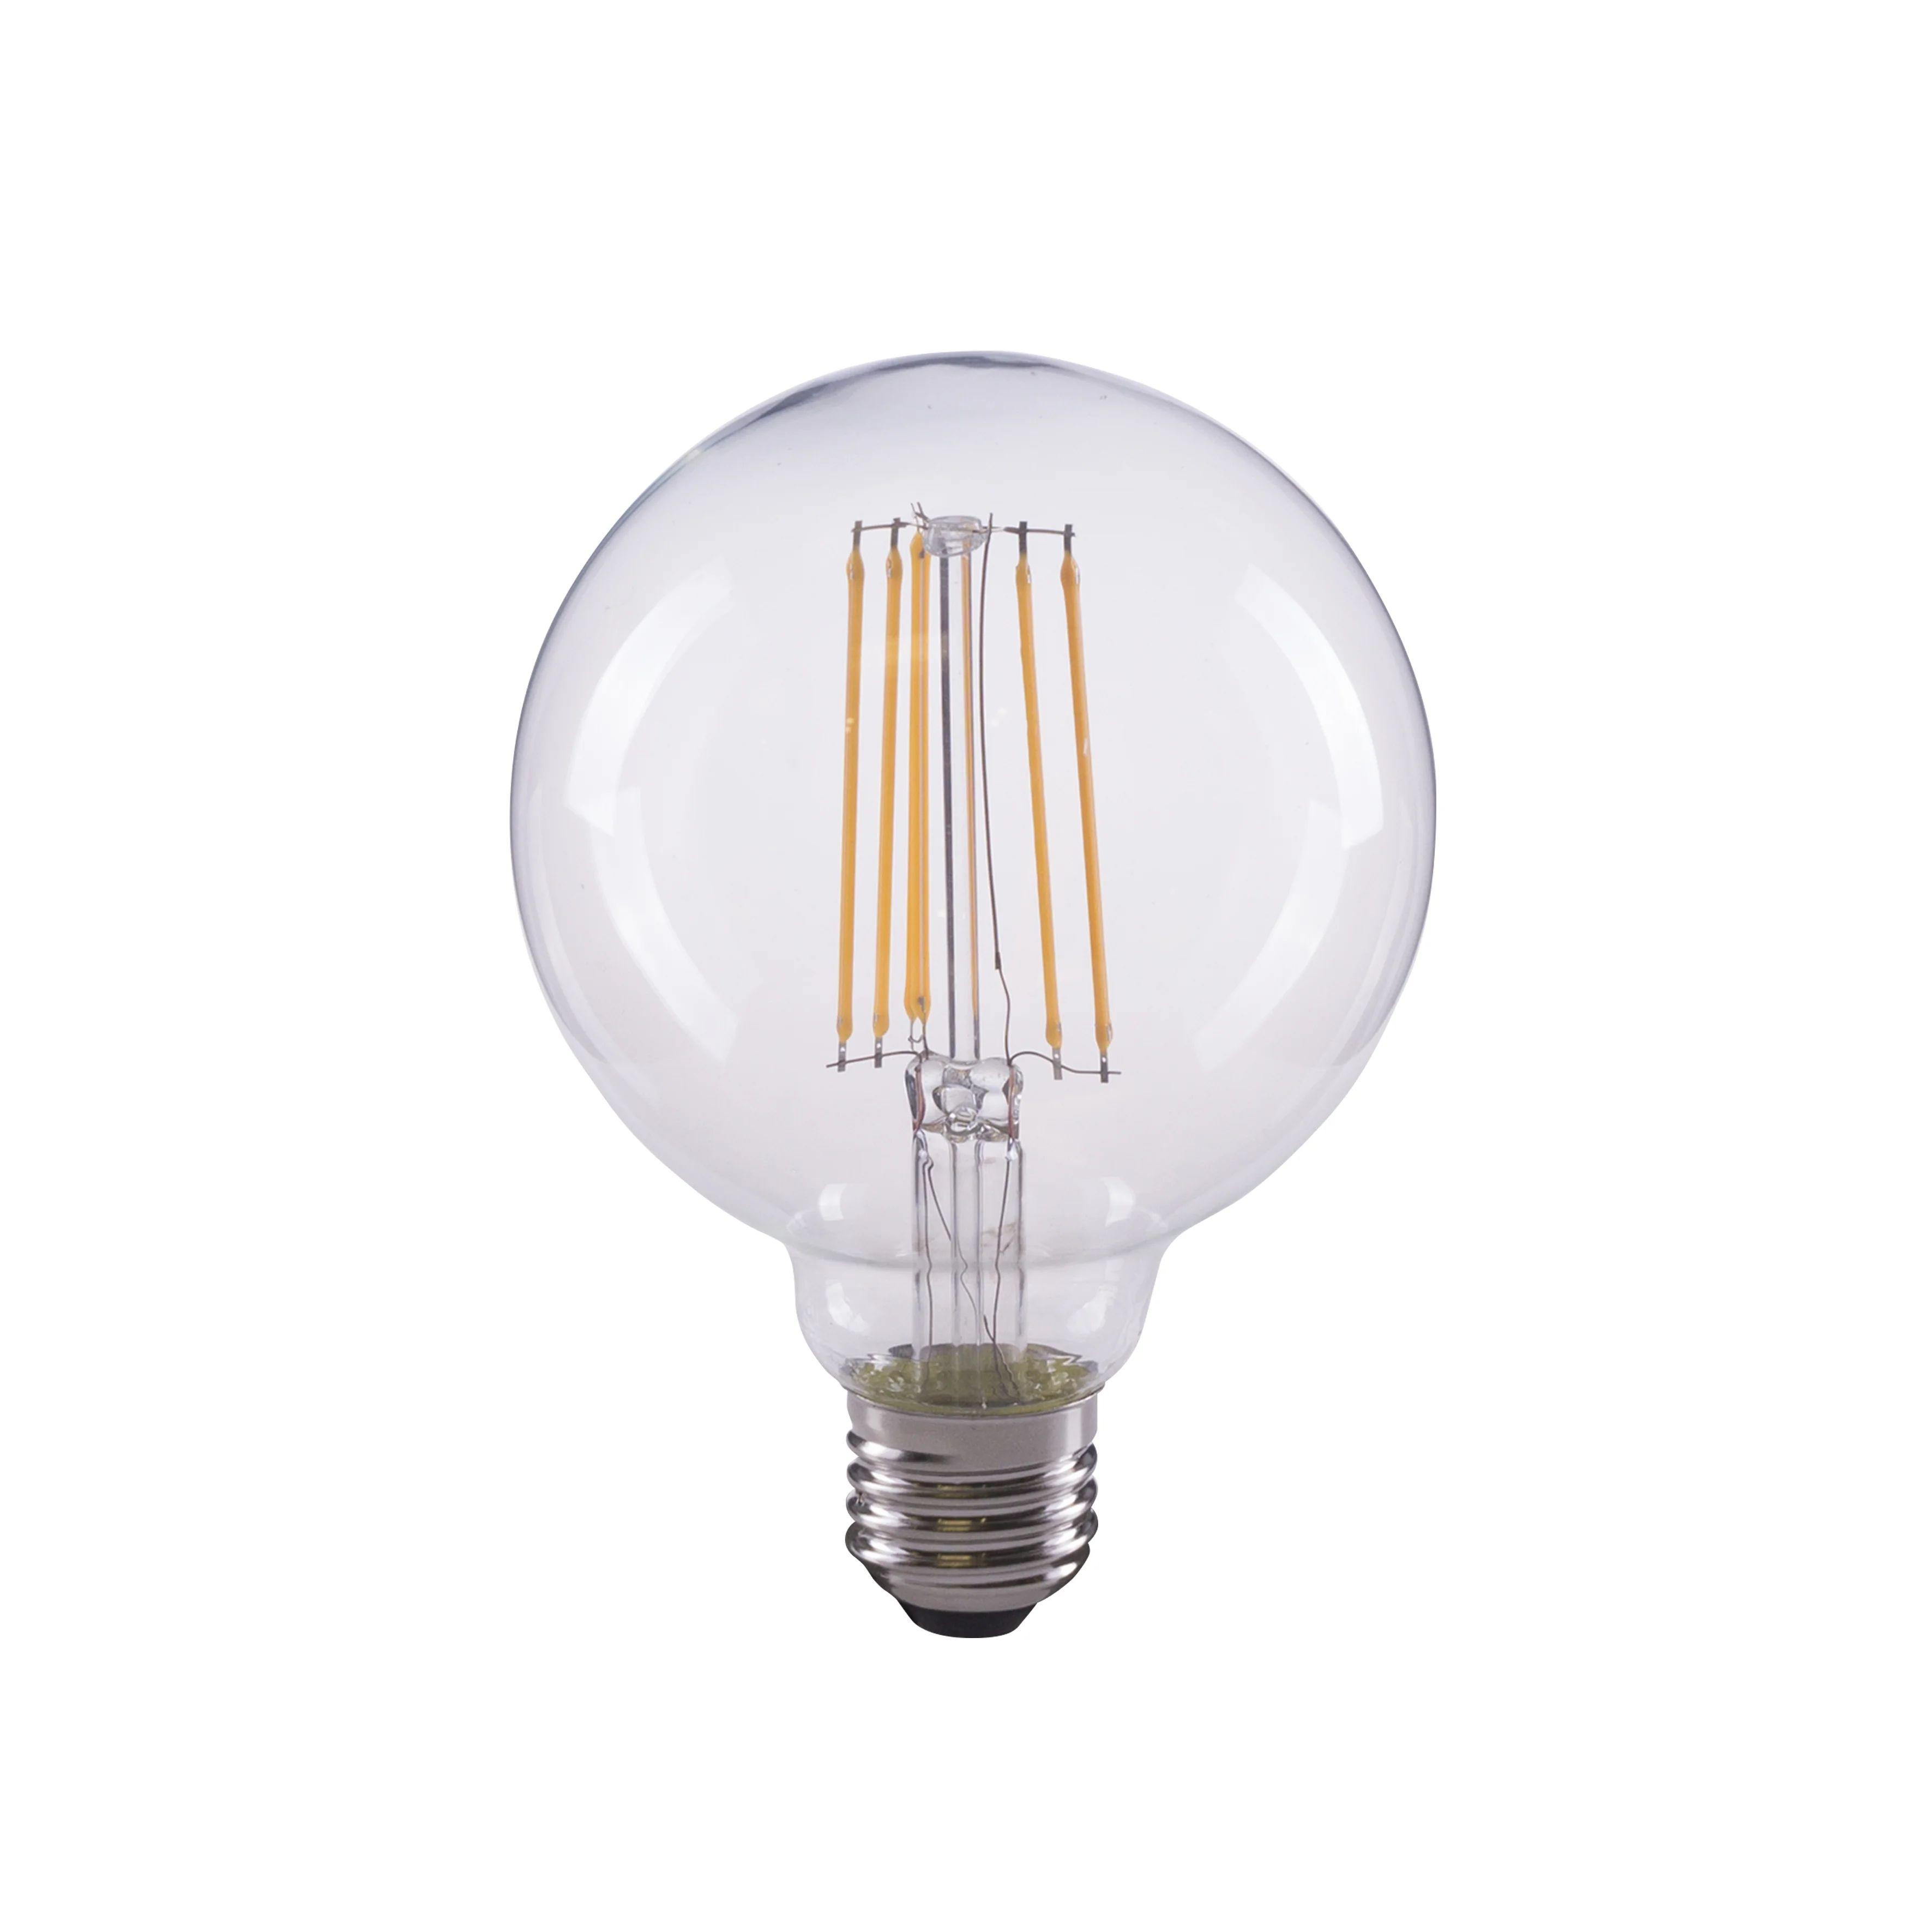 Ampoule Led A Filament Globe 95 Mm E27 1055 Lm 75 W Blanc Chaud Lexman Leroy Merlin